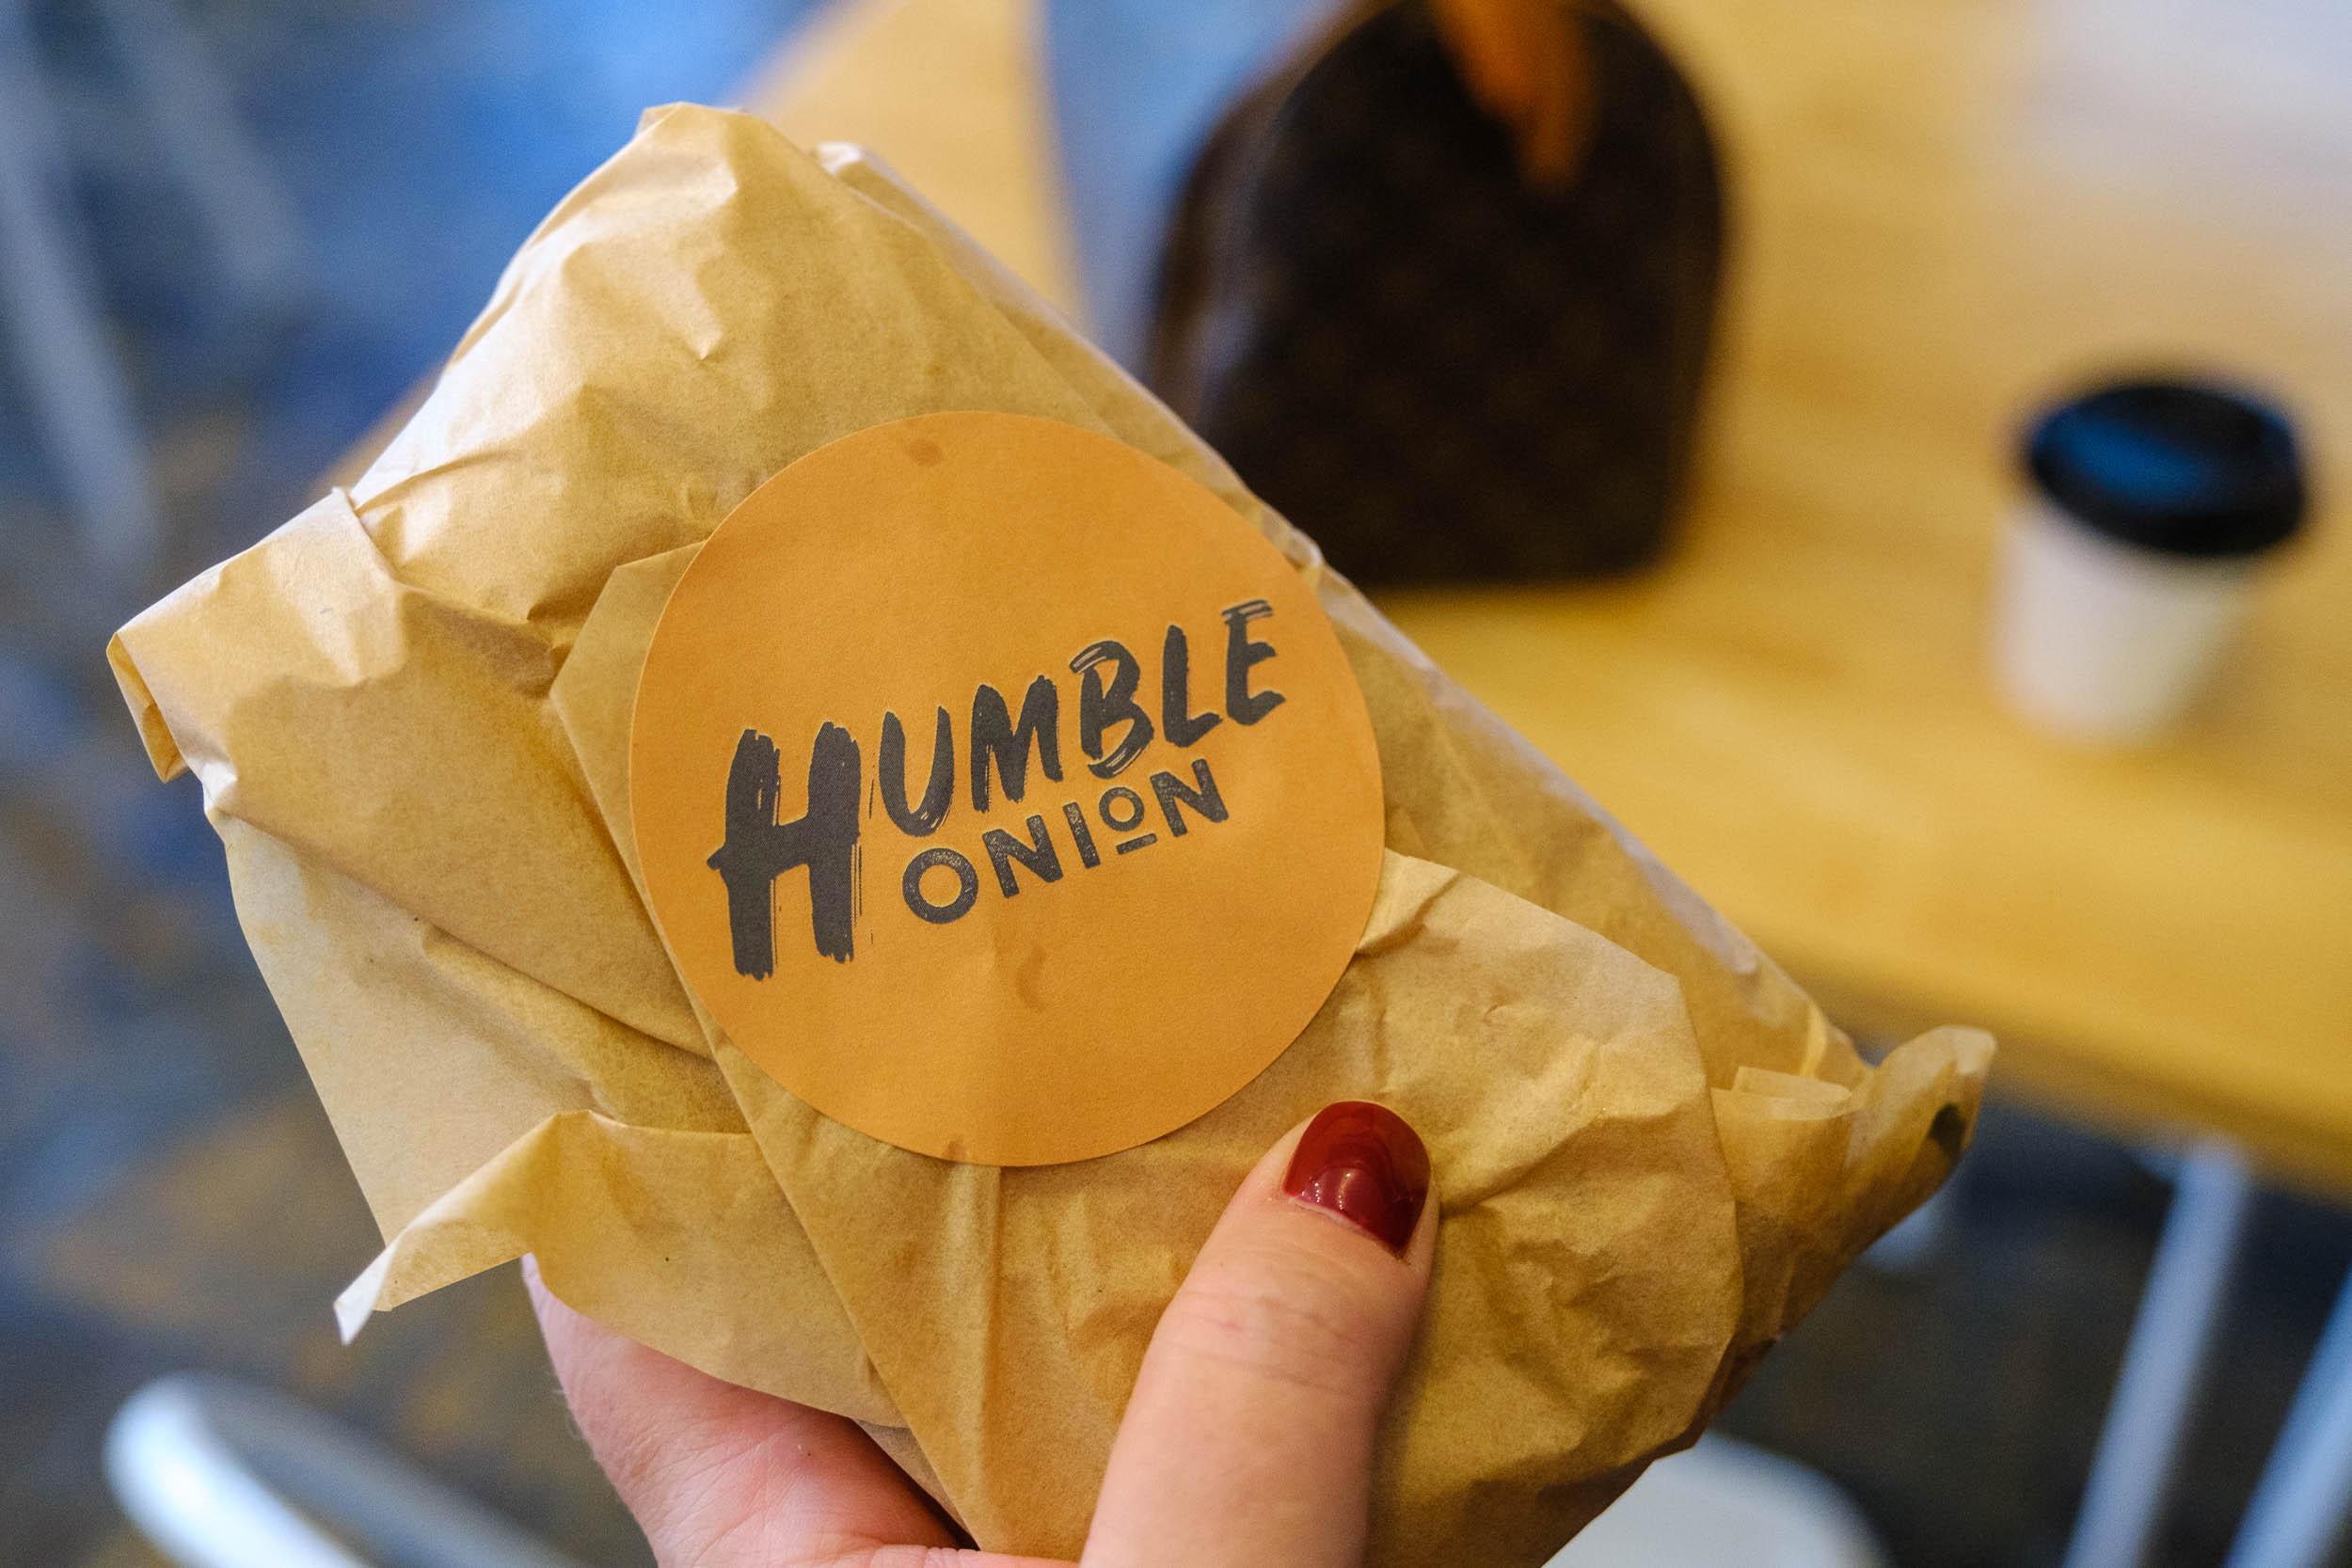 The Humble Onion